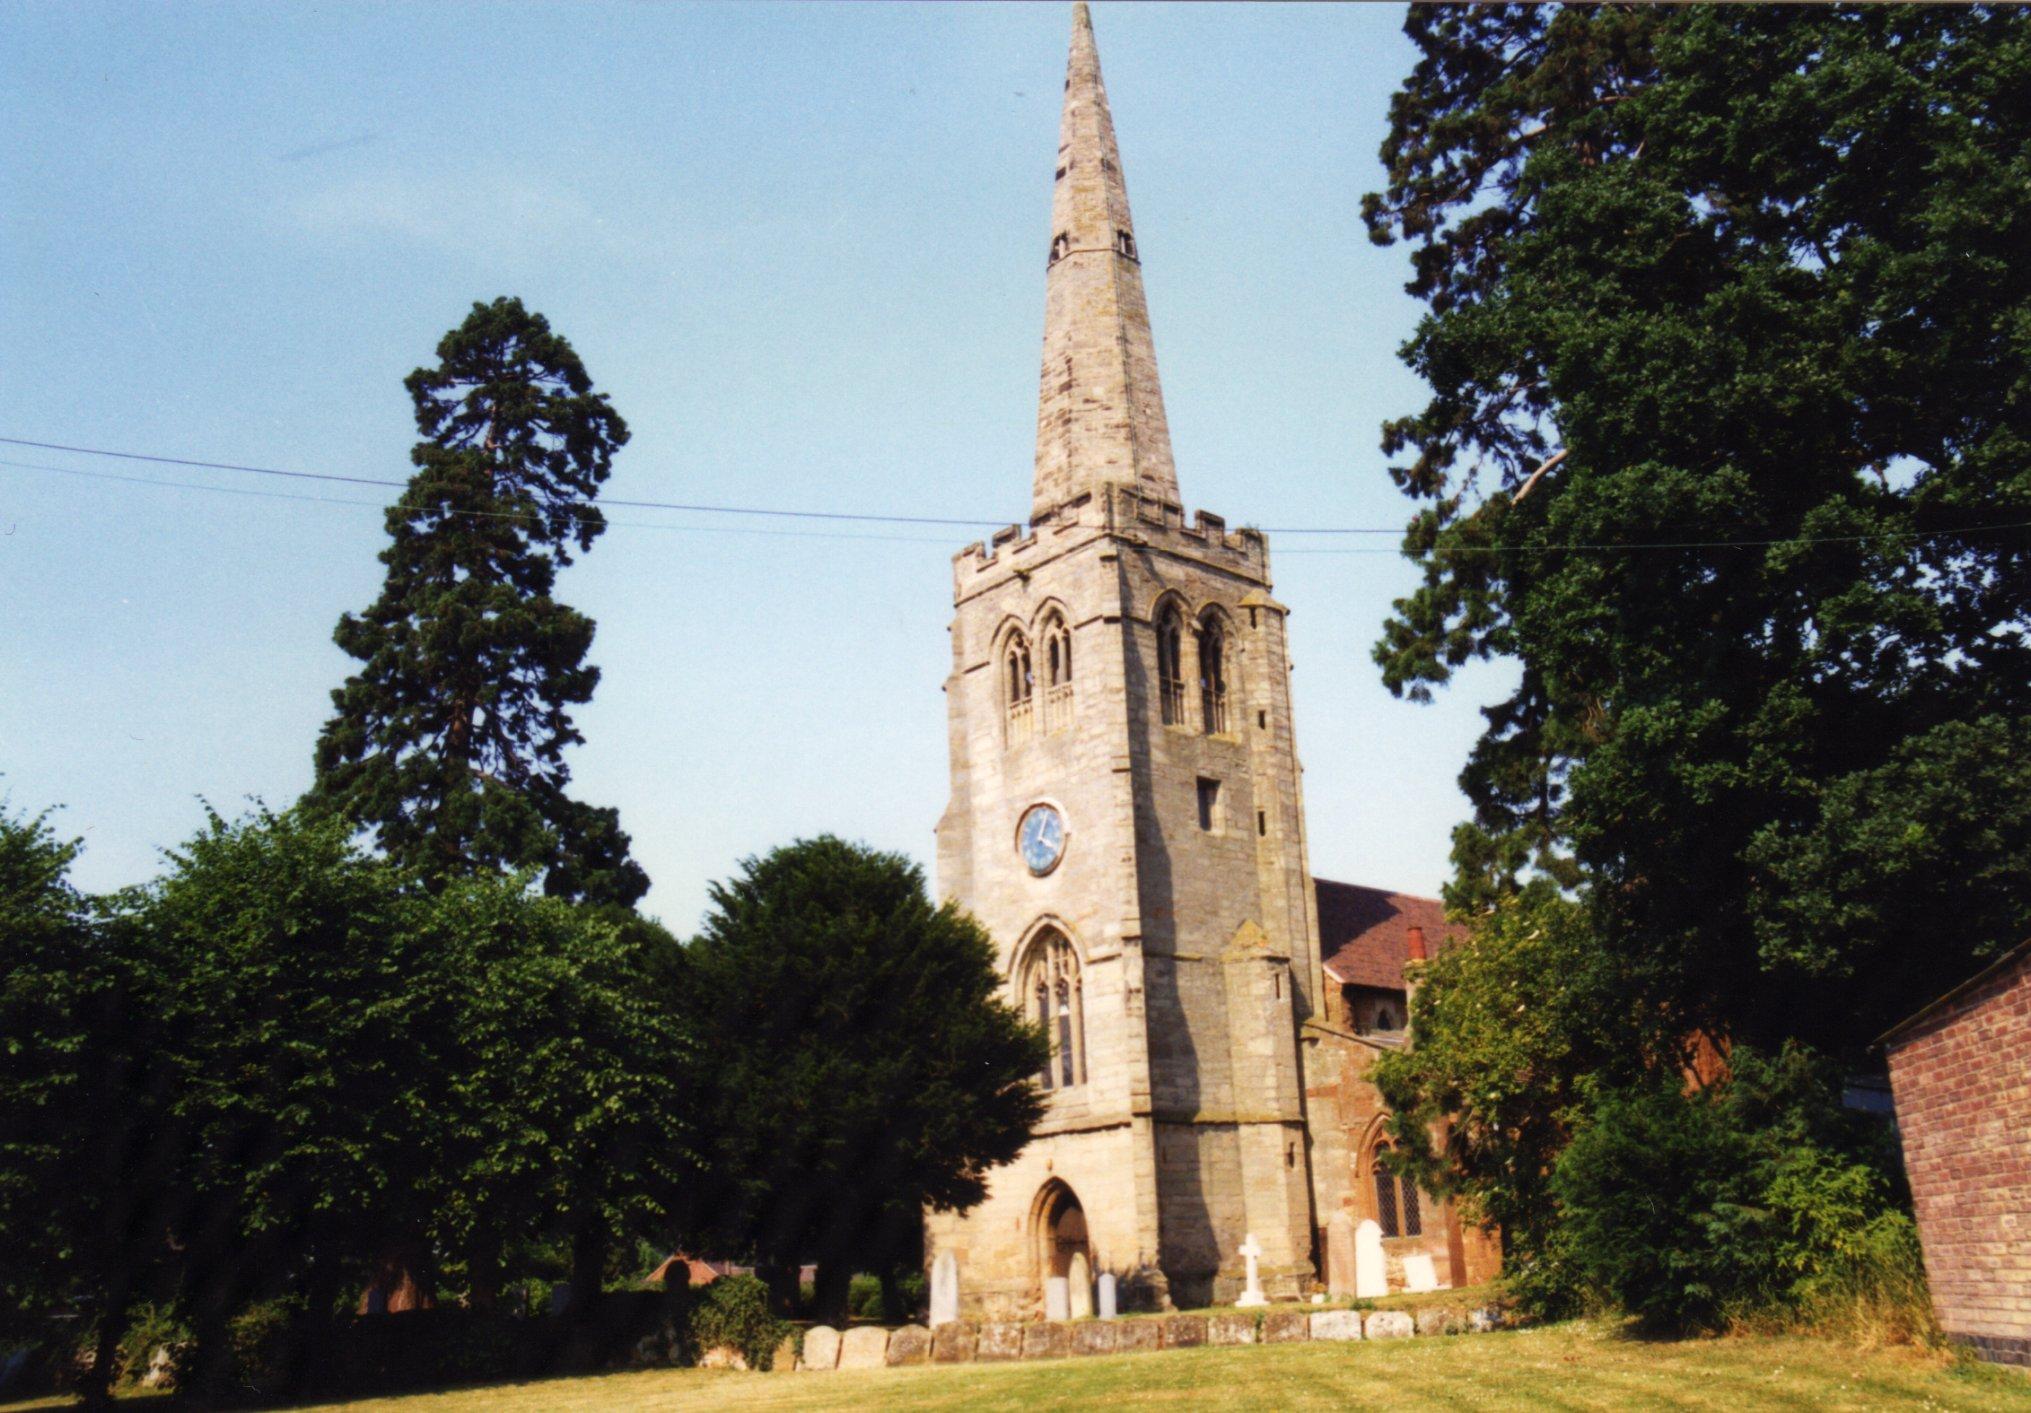 St.Peter's, Grandborough